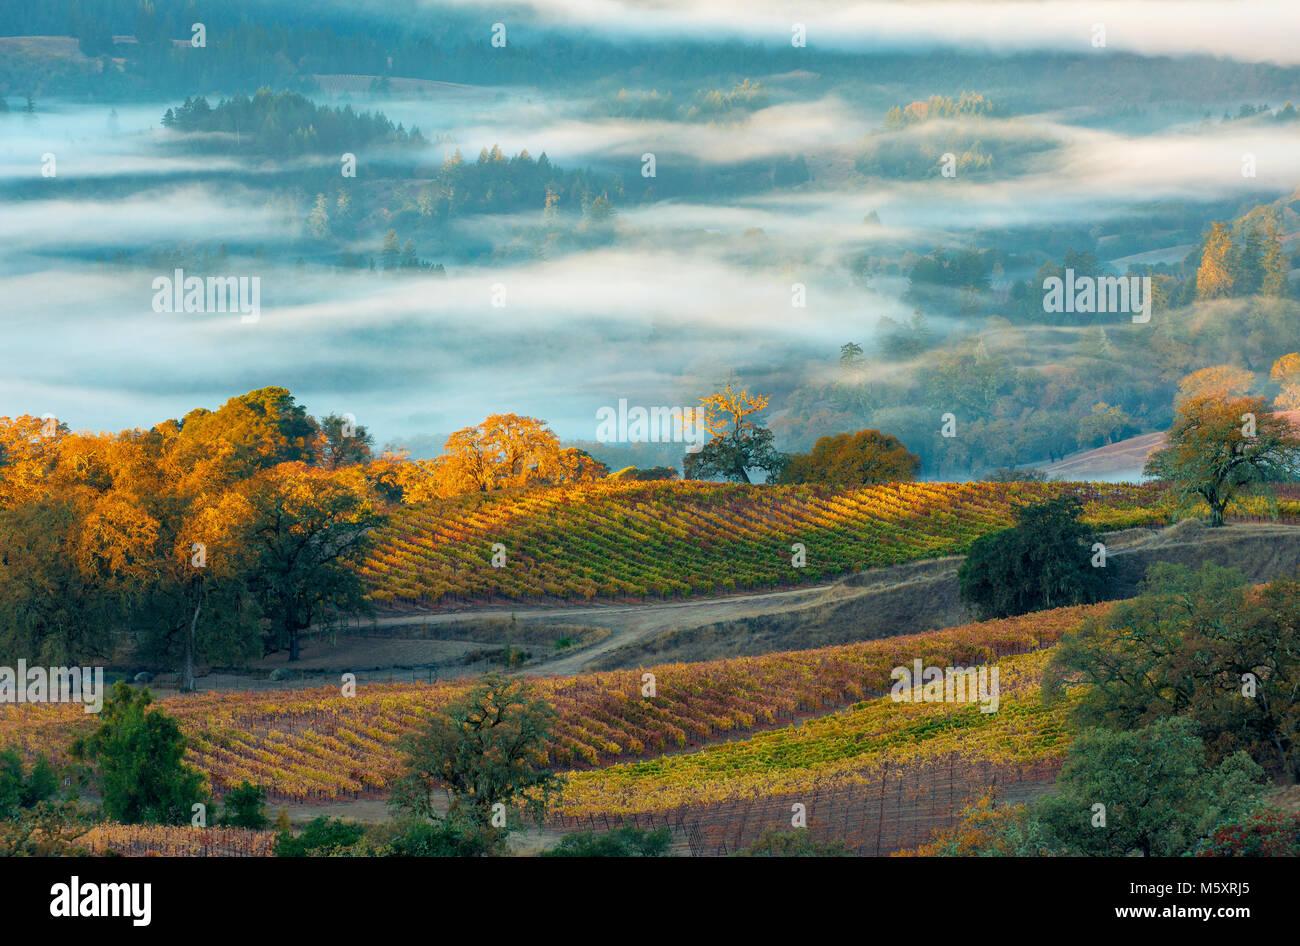 Sunrise, Marietta Vineyards, Yorkville Highlands, Mendocino County, California - Stock Image